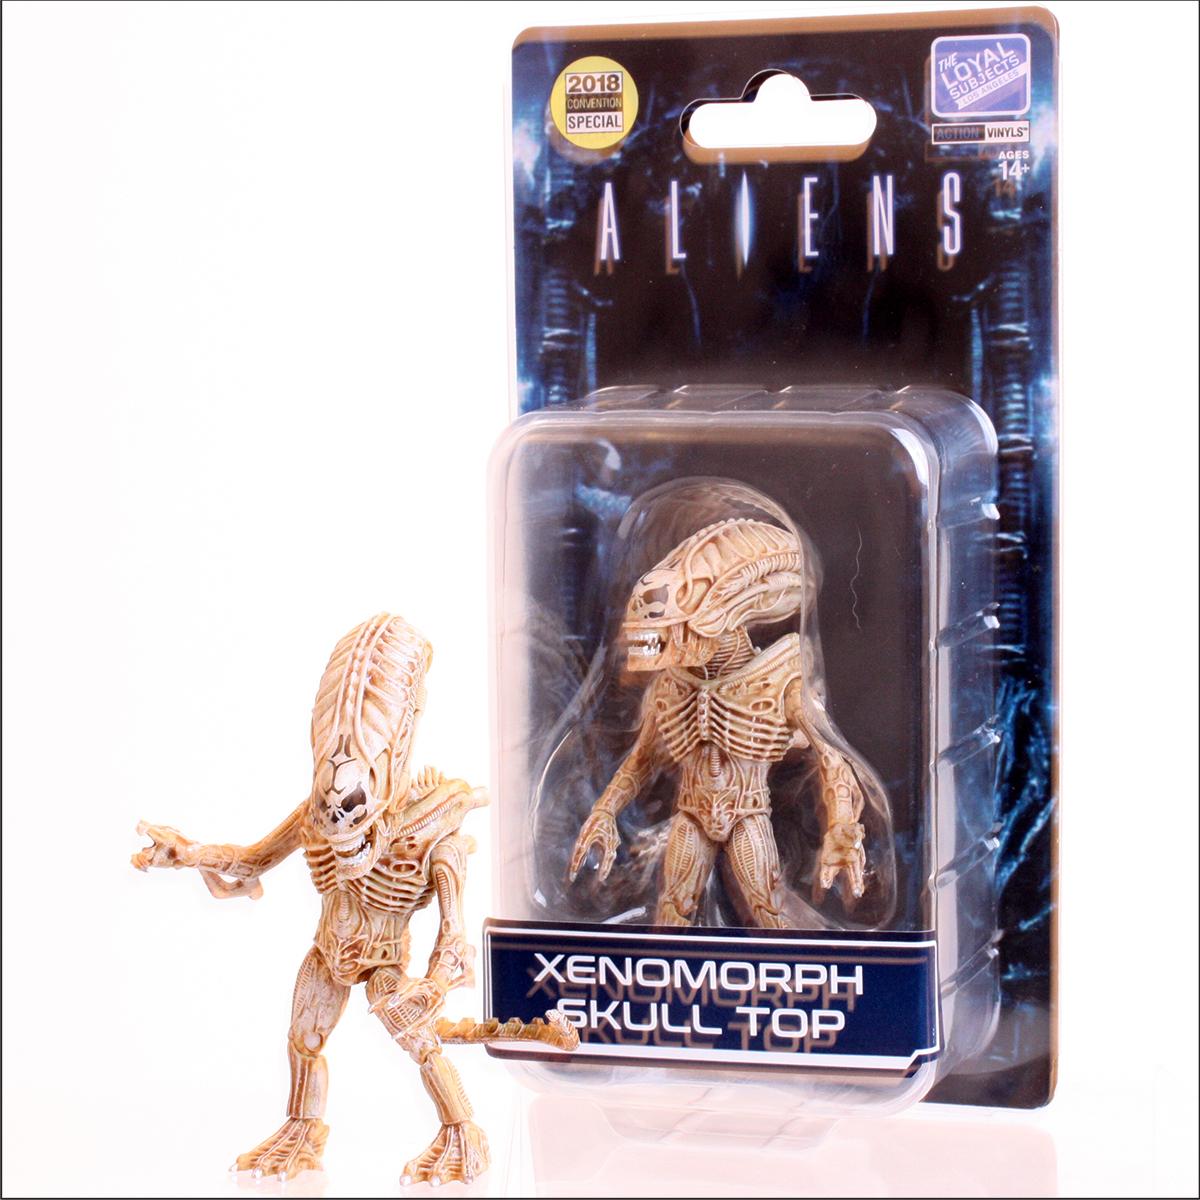 The Loyal Subject: Aliens Xenomorph Skull Top (Exoskeleton Alien Warrior) LIMITED